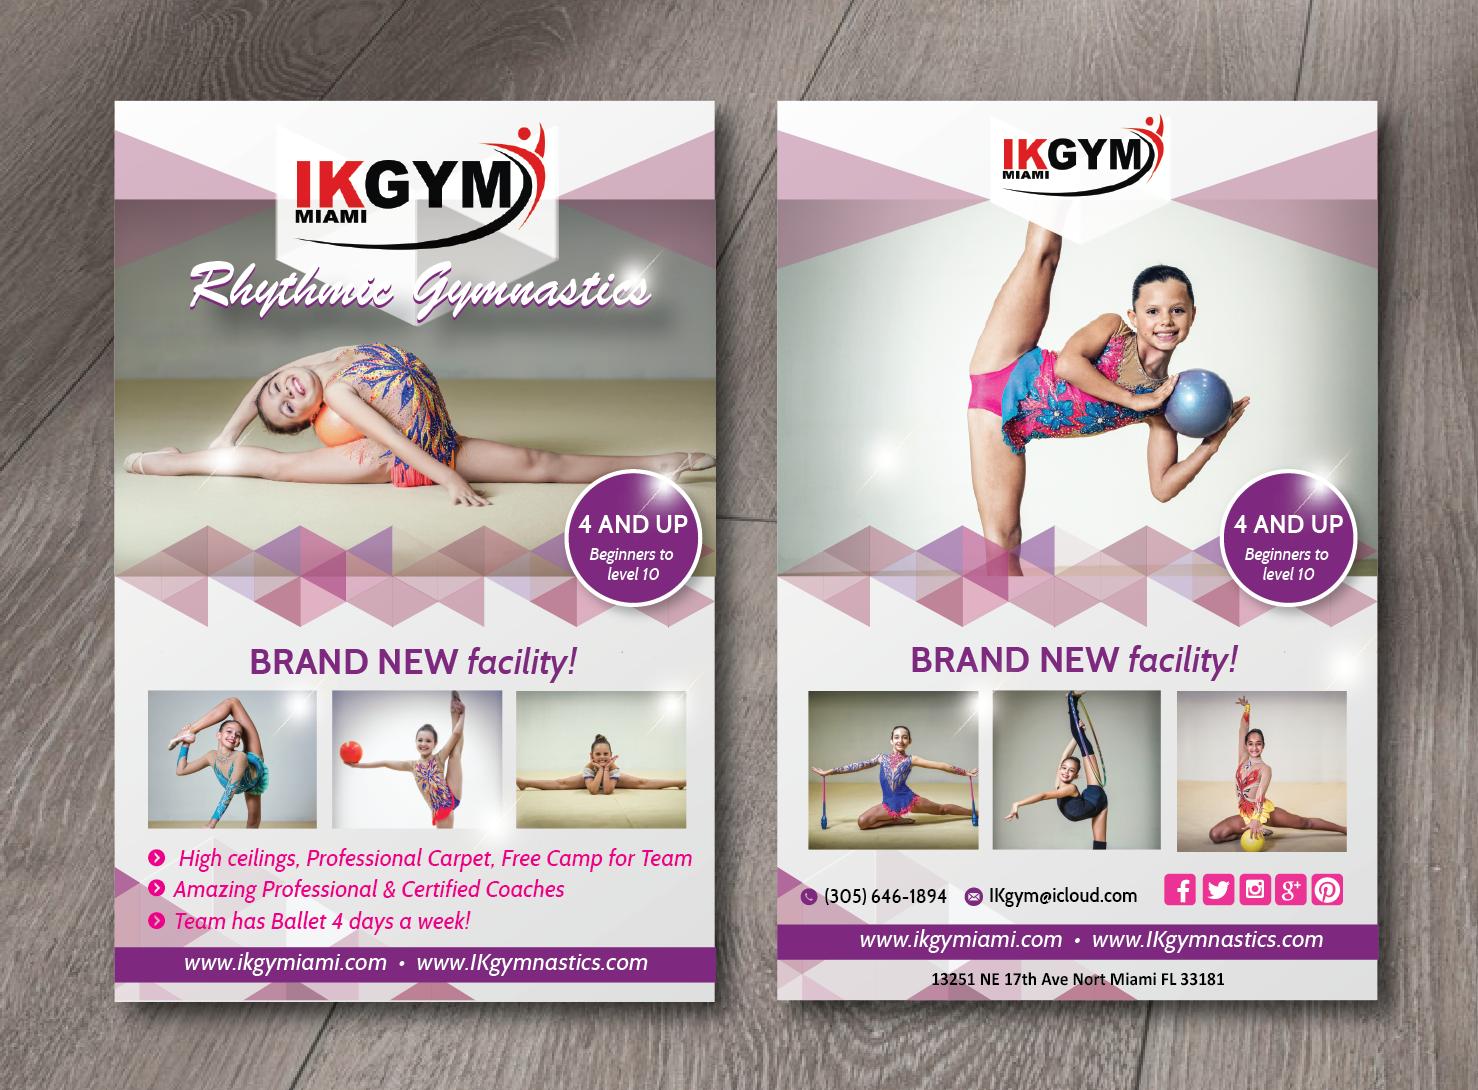 Fitness Flyer Design Galleries for Inspiration